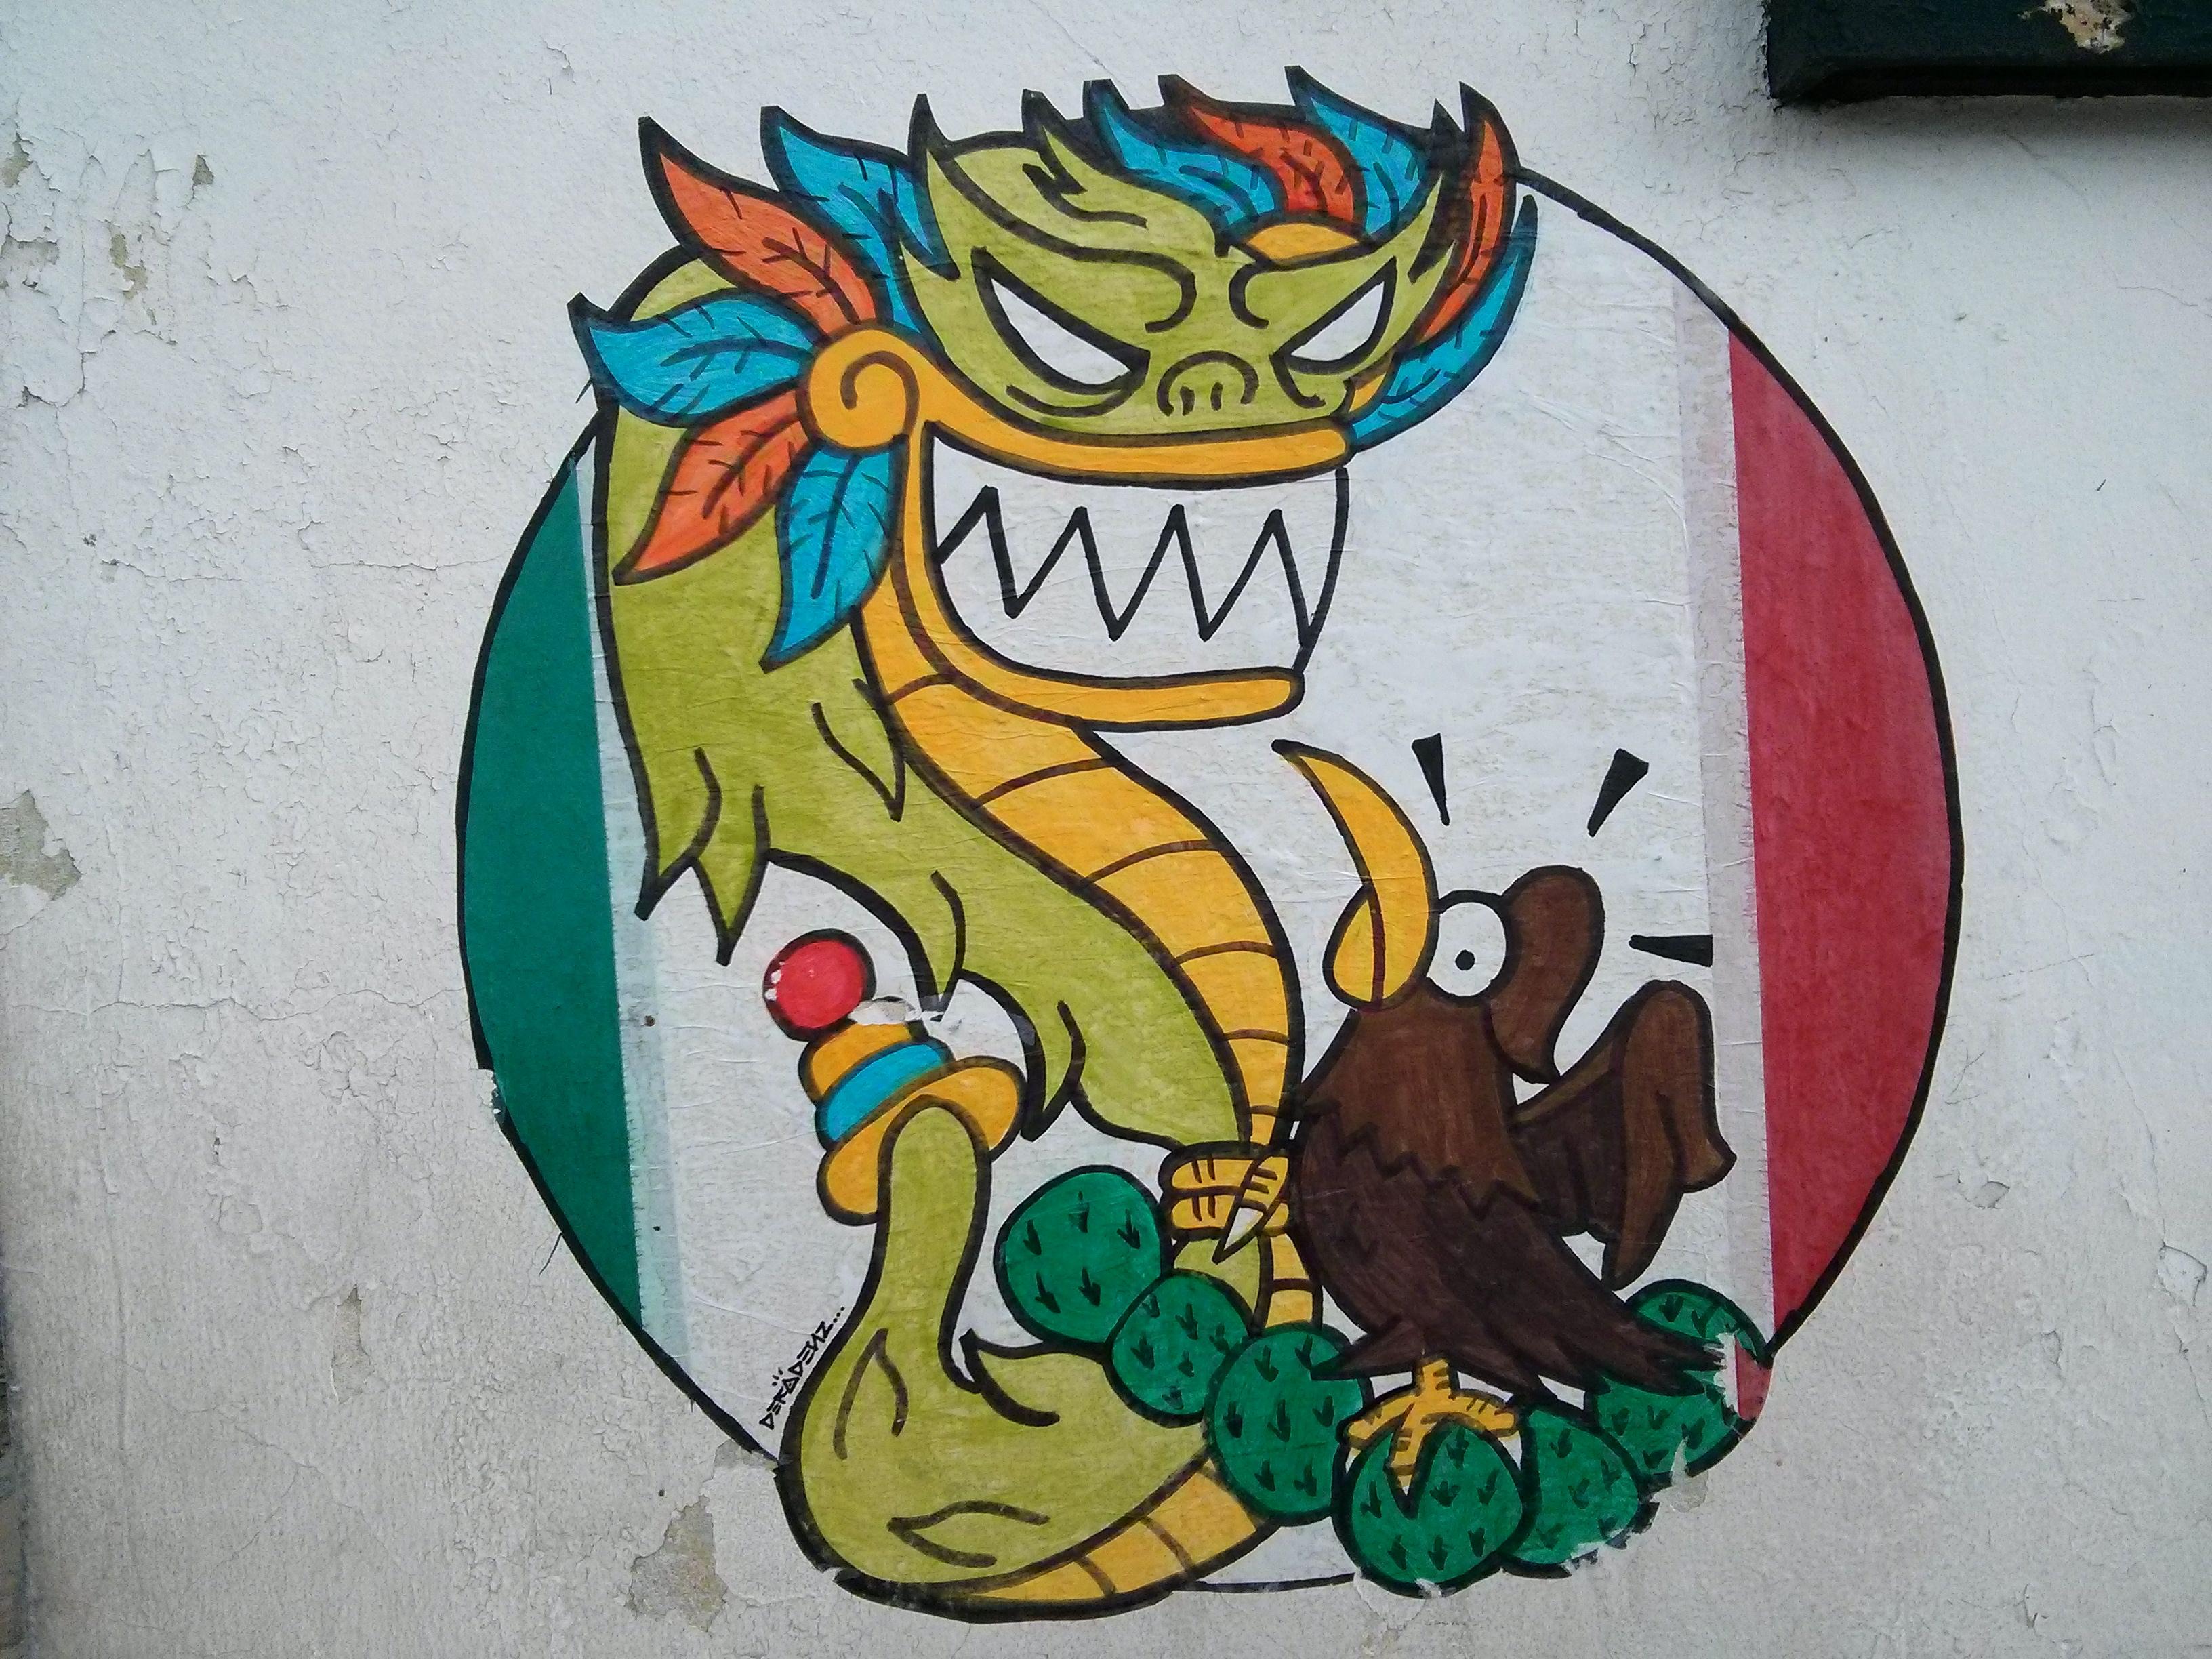 San Cristóbal De Las Casas Chiapas The Logistics Bicycles And